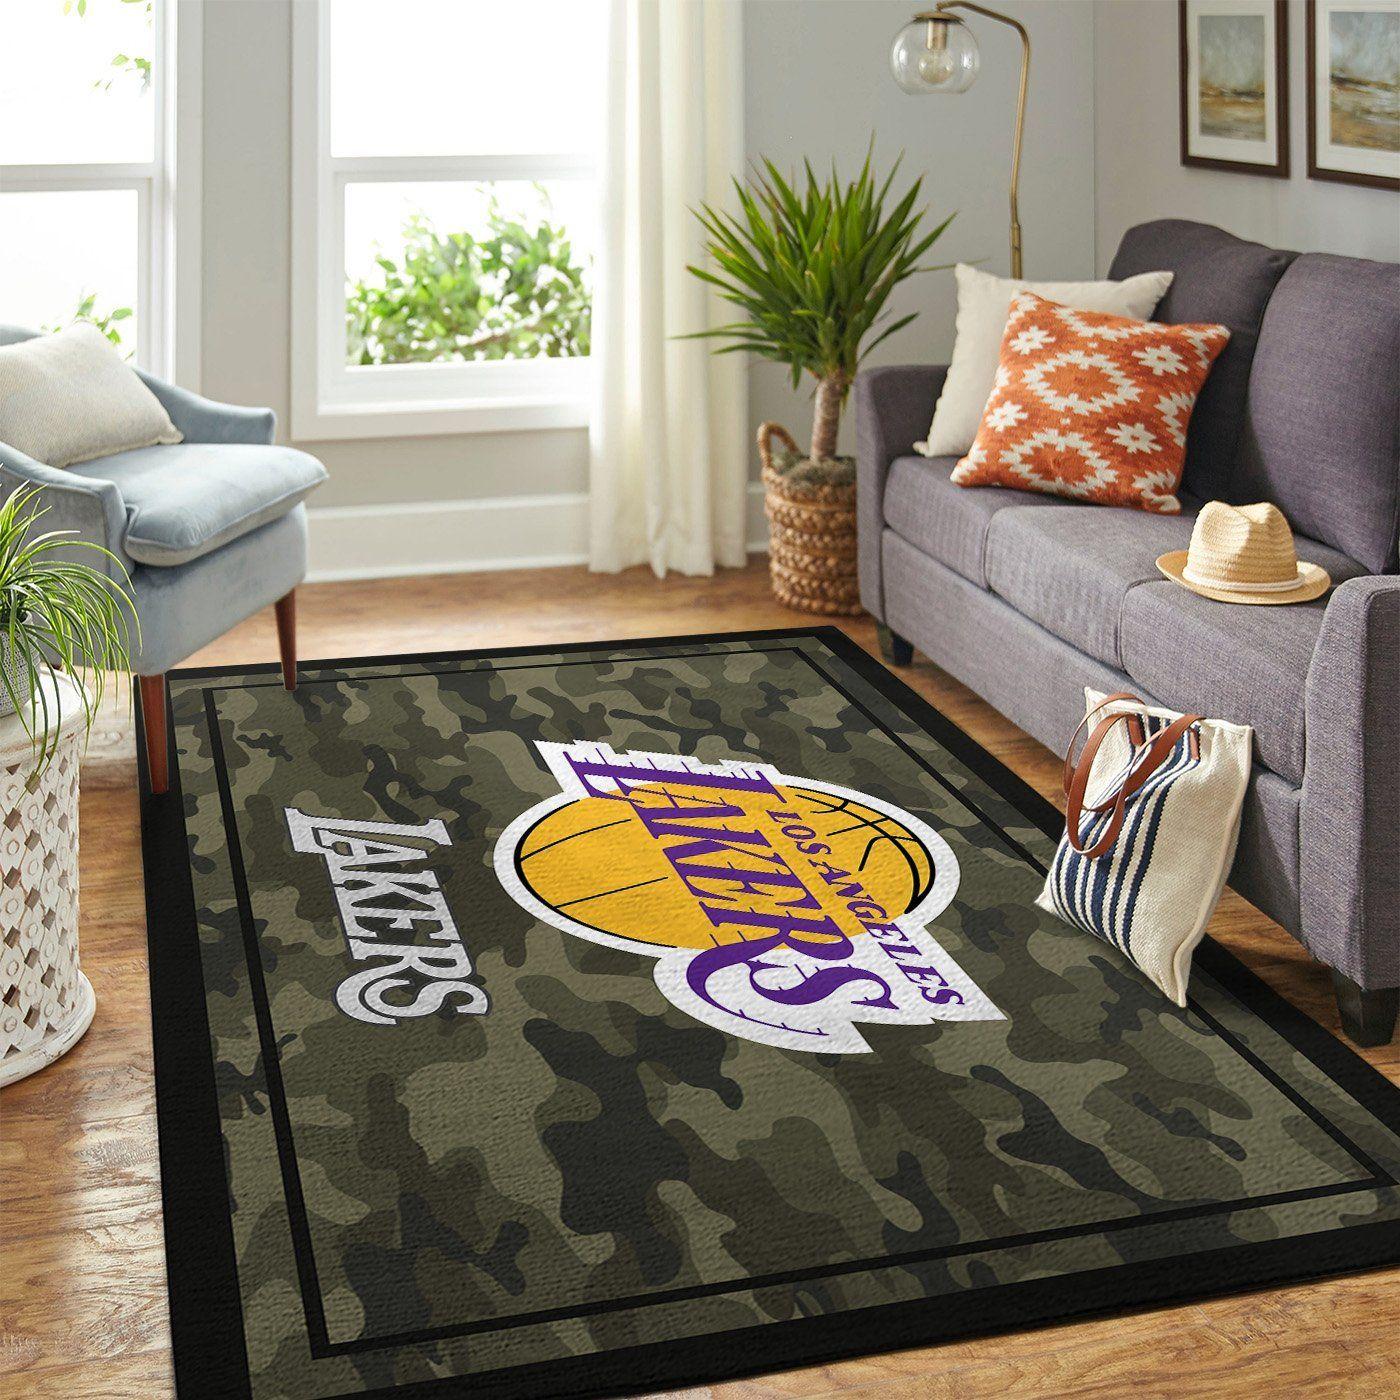 Amazon Los Angeles Lakers Living Room Area No3619 Rug